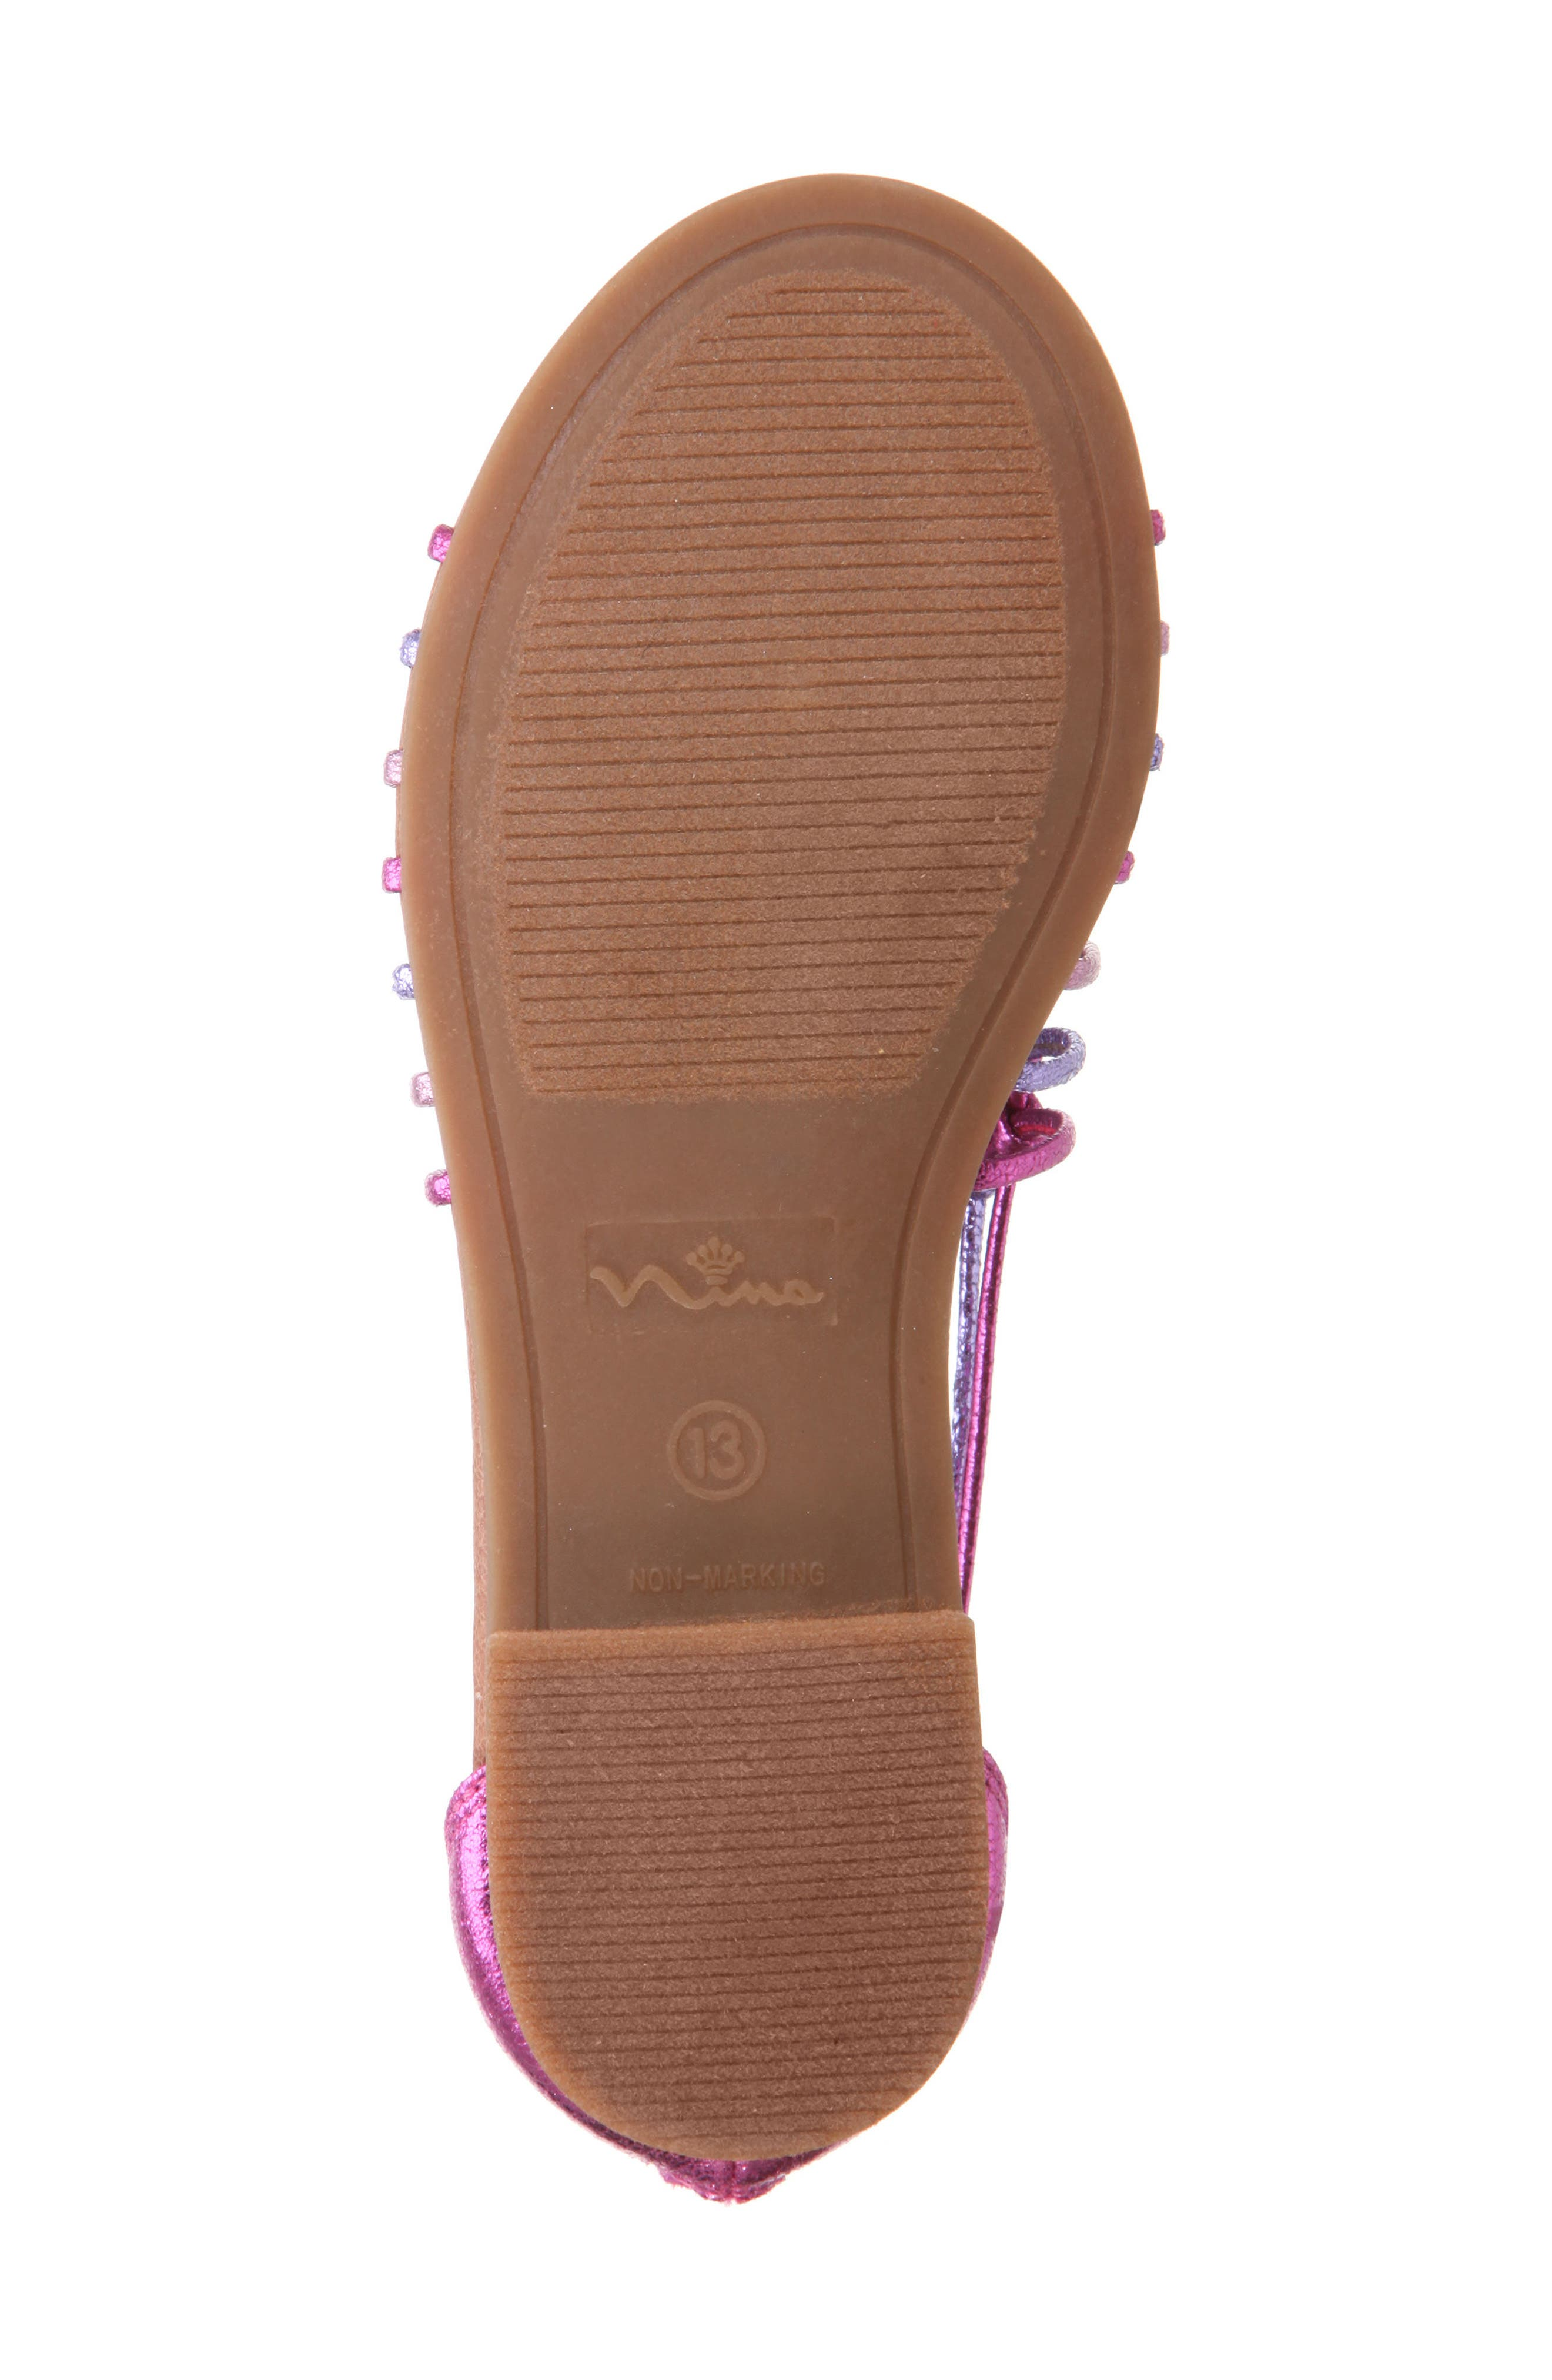 Karlee Embellished Sandal,                             Alternate thumbnail 6, color,                             Pink Multi Metallic Crackle